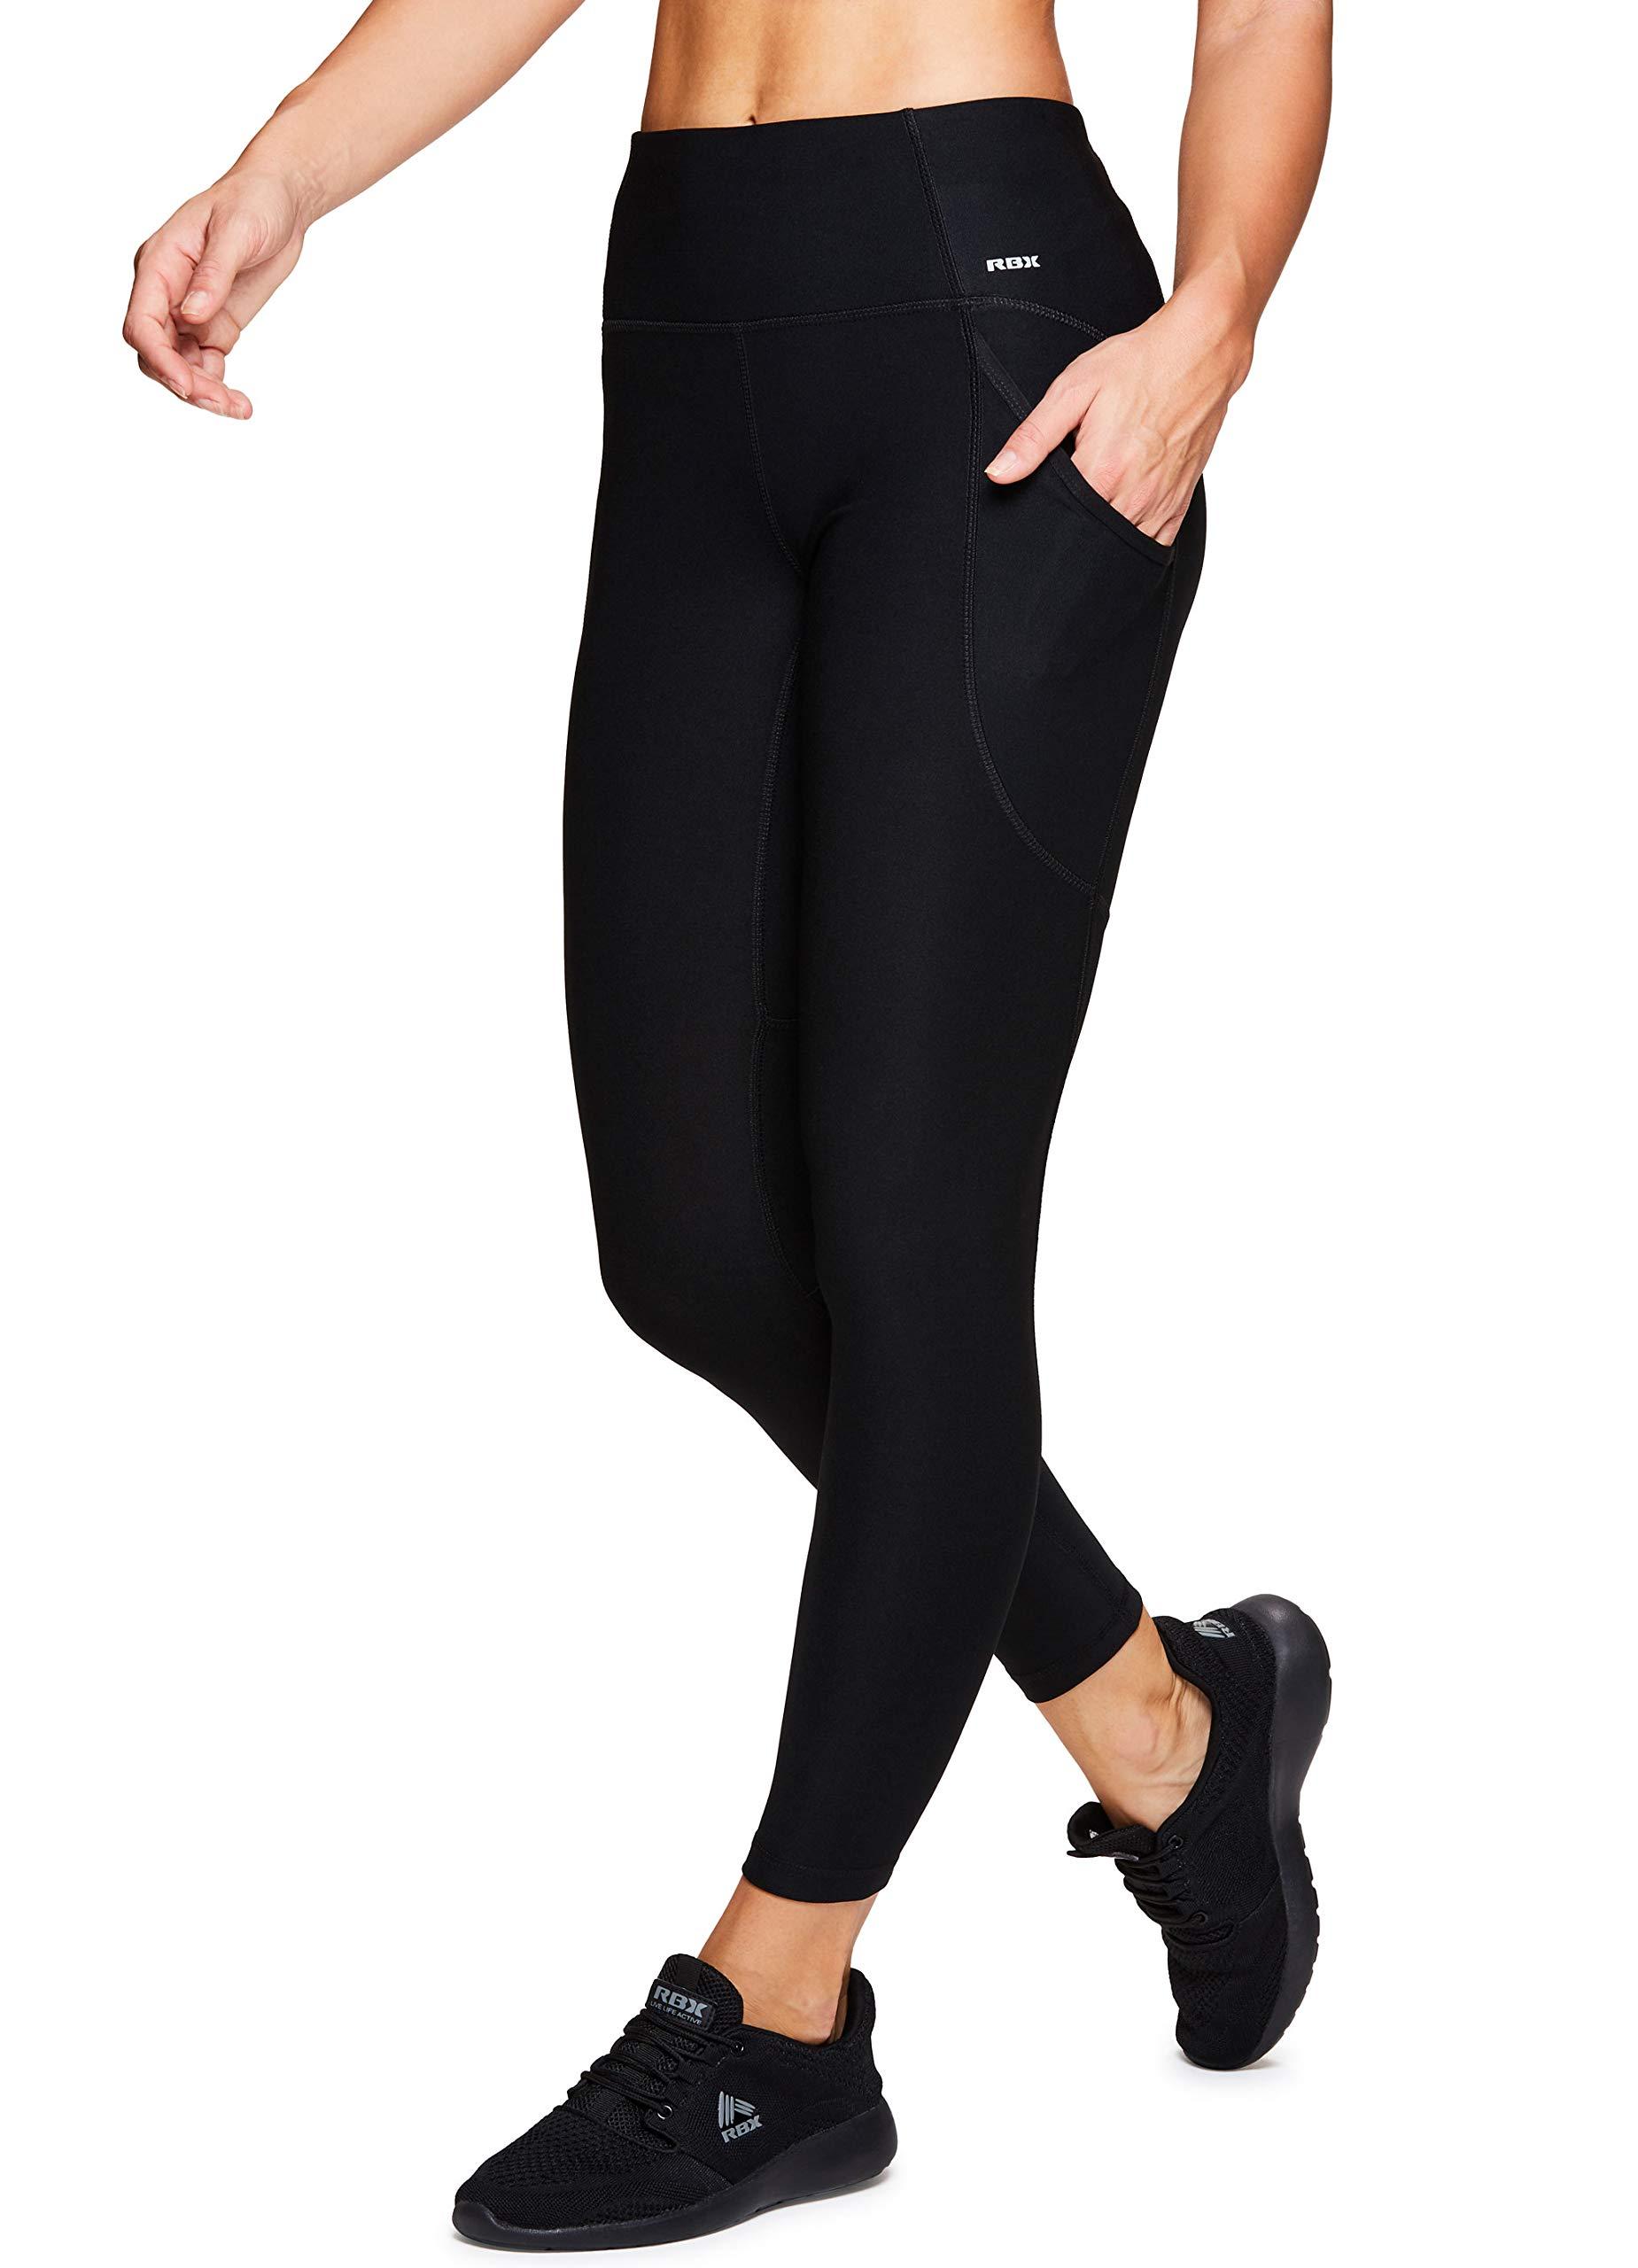 RBX Active Women's Workout Yoga Leggings Black S19 S